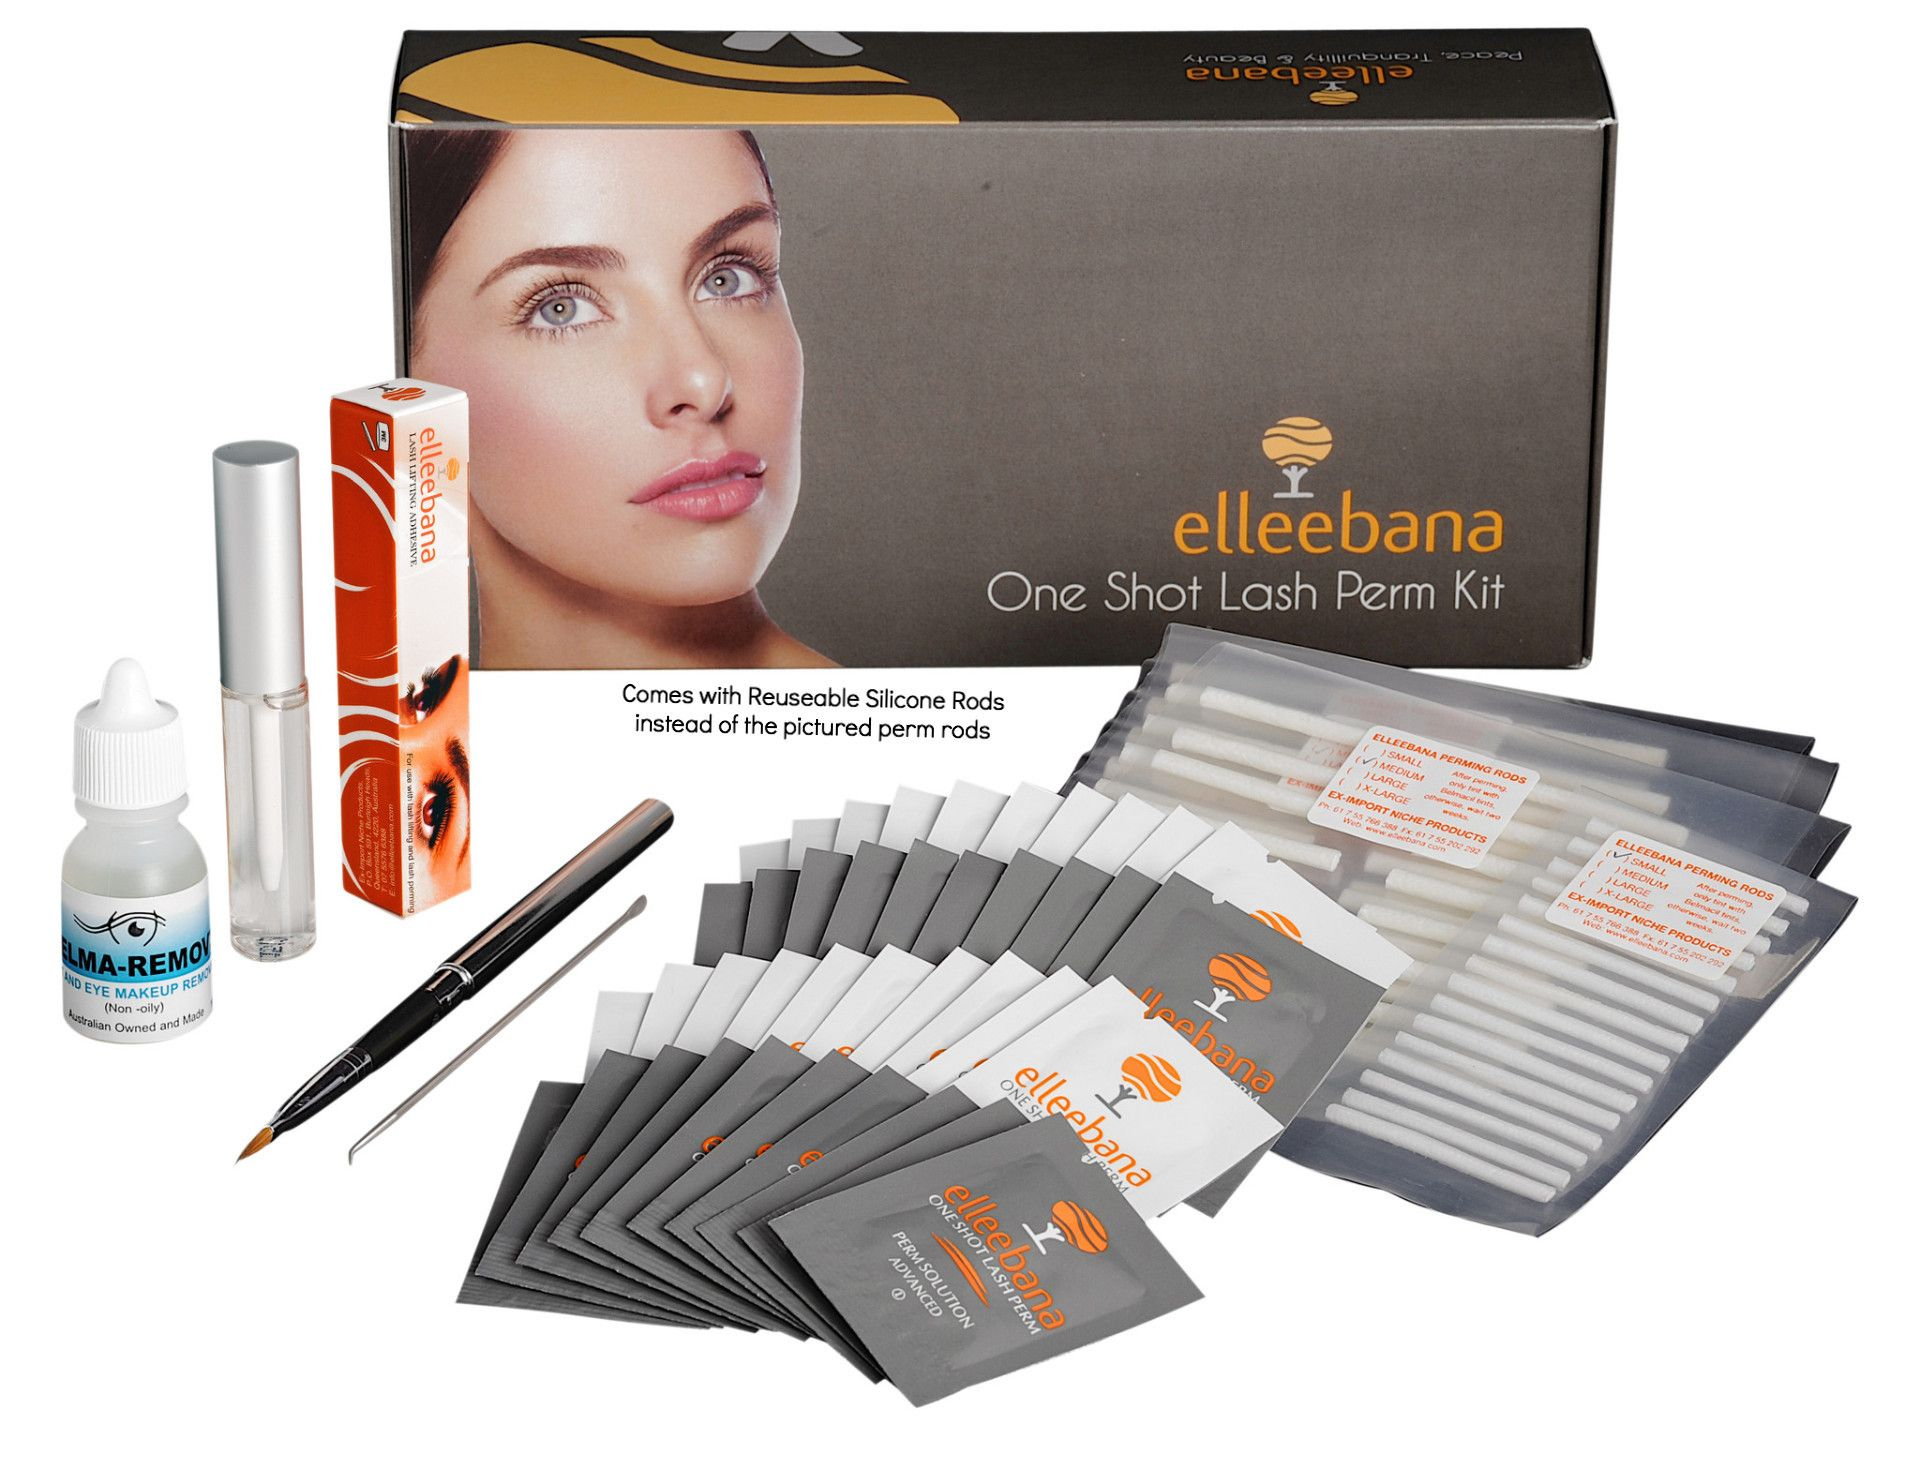 0524c9ace74 Elleebana One Shot Lash Lift Kit - Full Size - The Lash Shop @ StellaLash